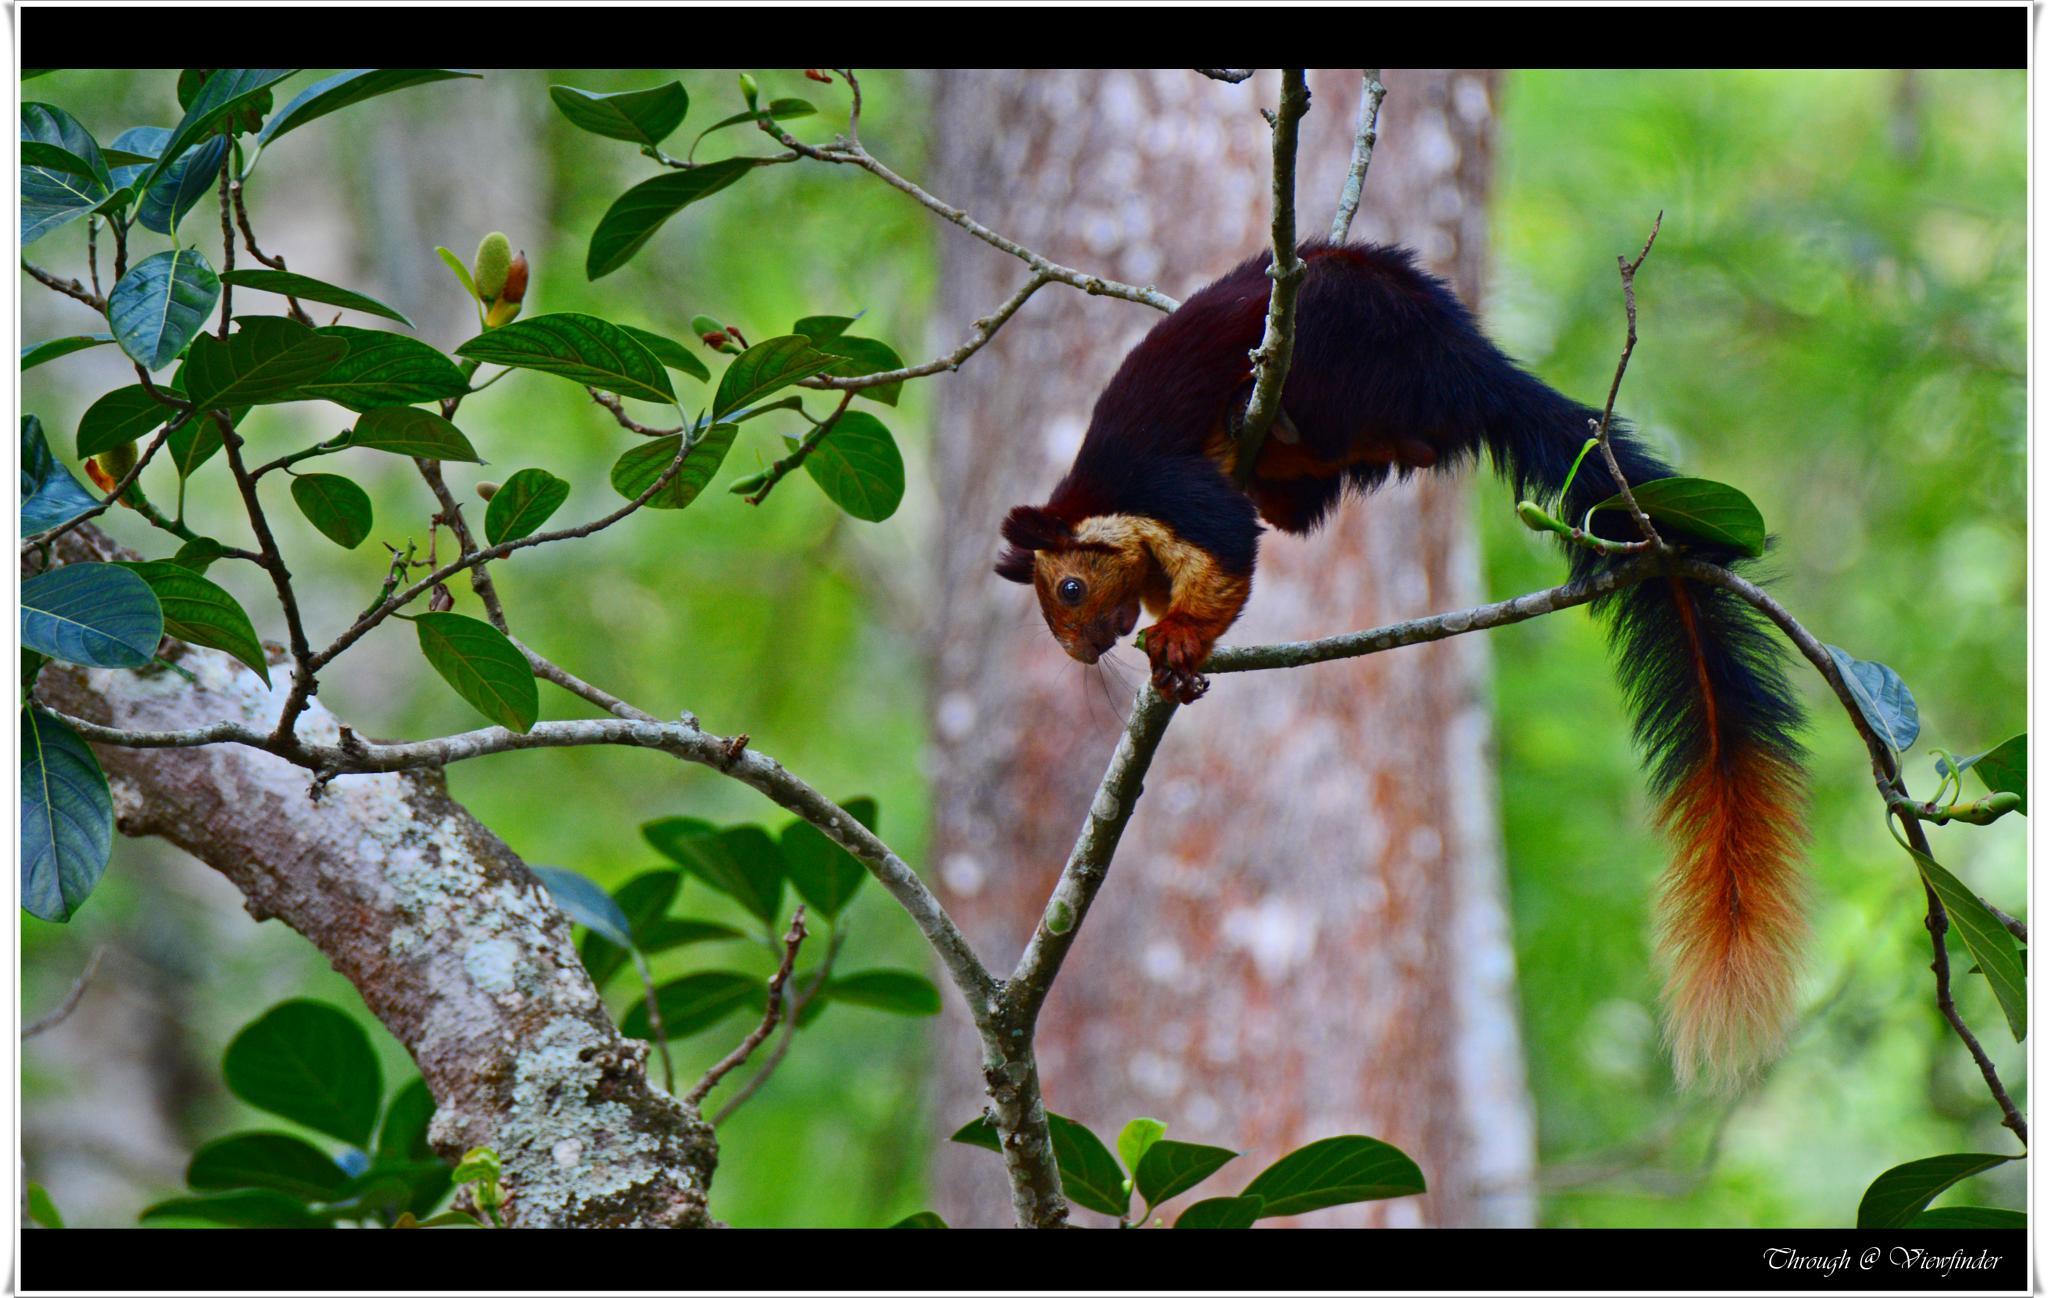 Indian giant squirrel by prashobh.ailyam